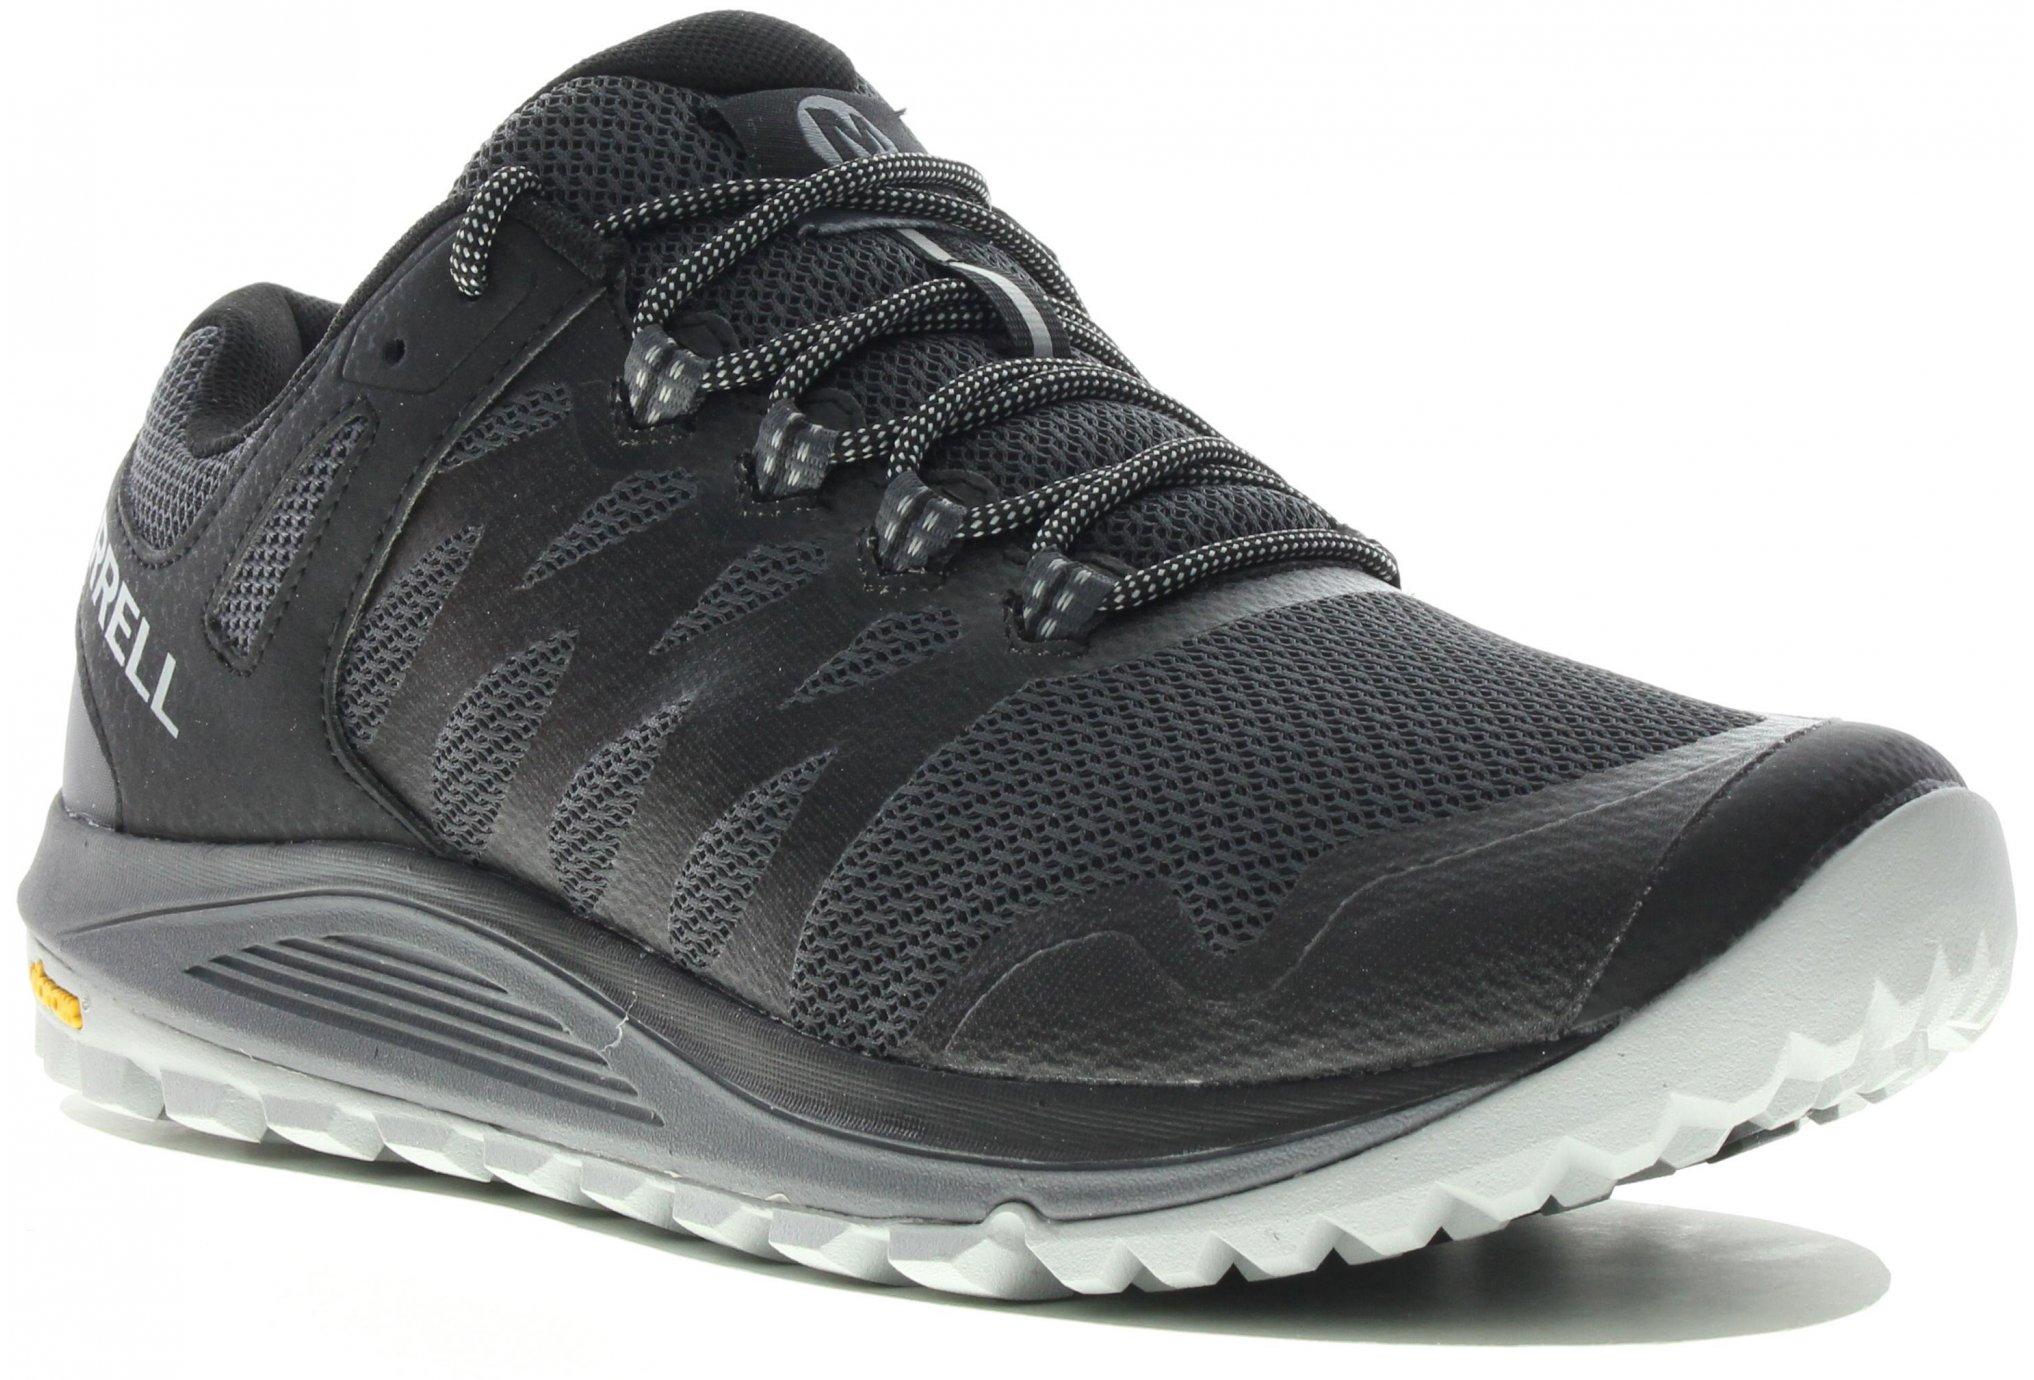 Merrell Nova 2 M Chaussures homme